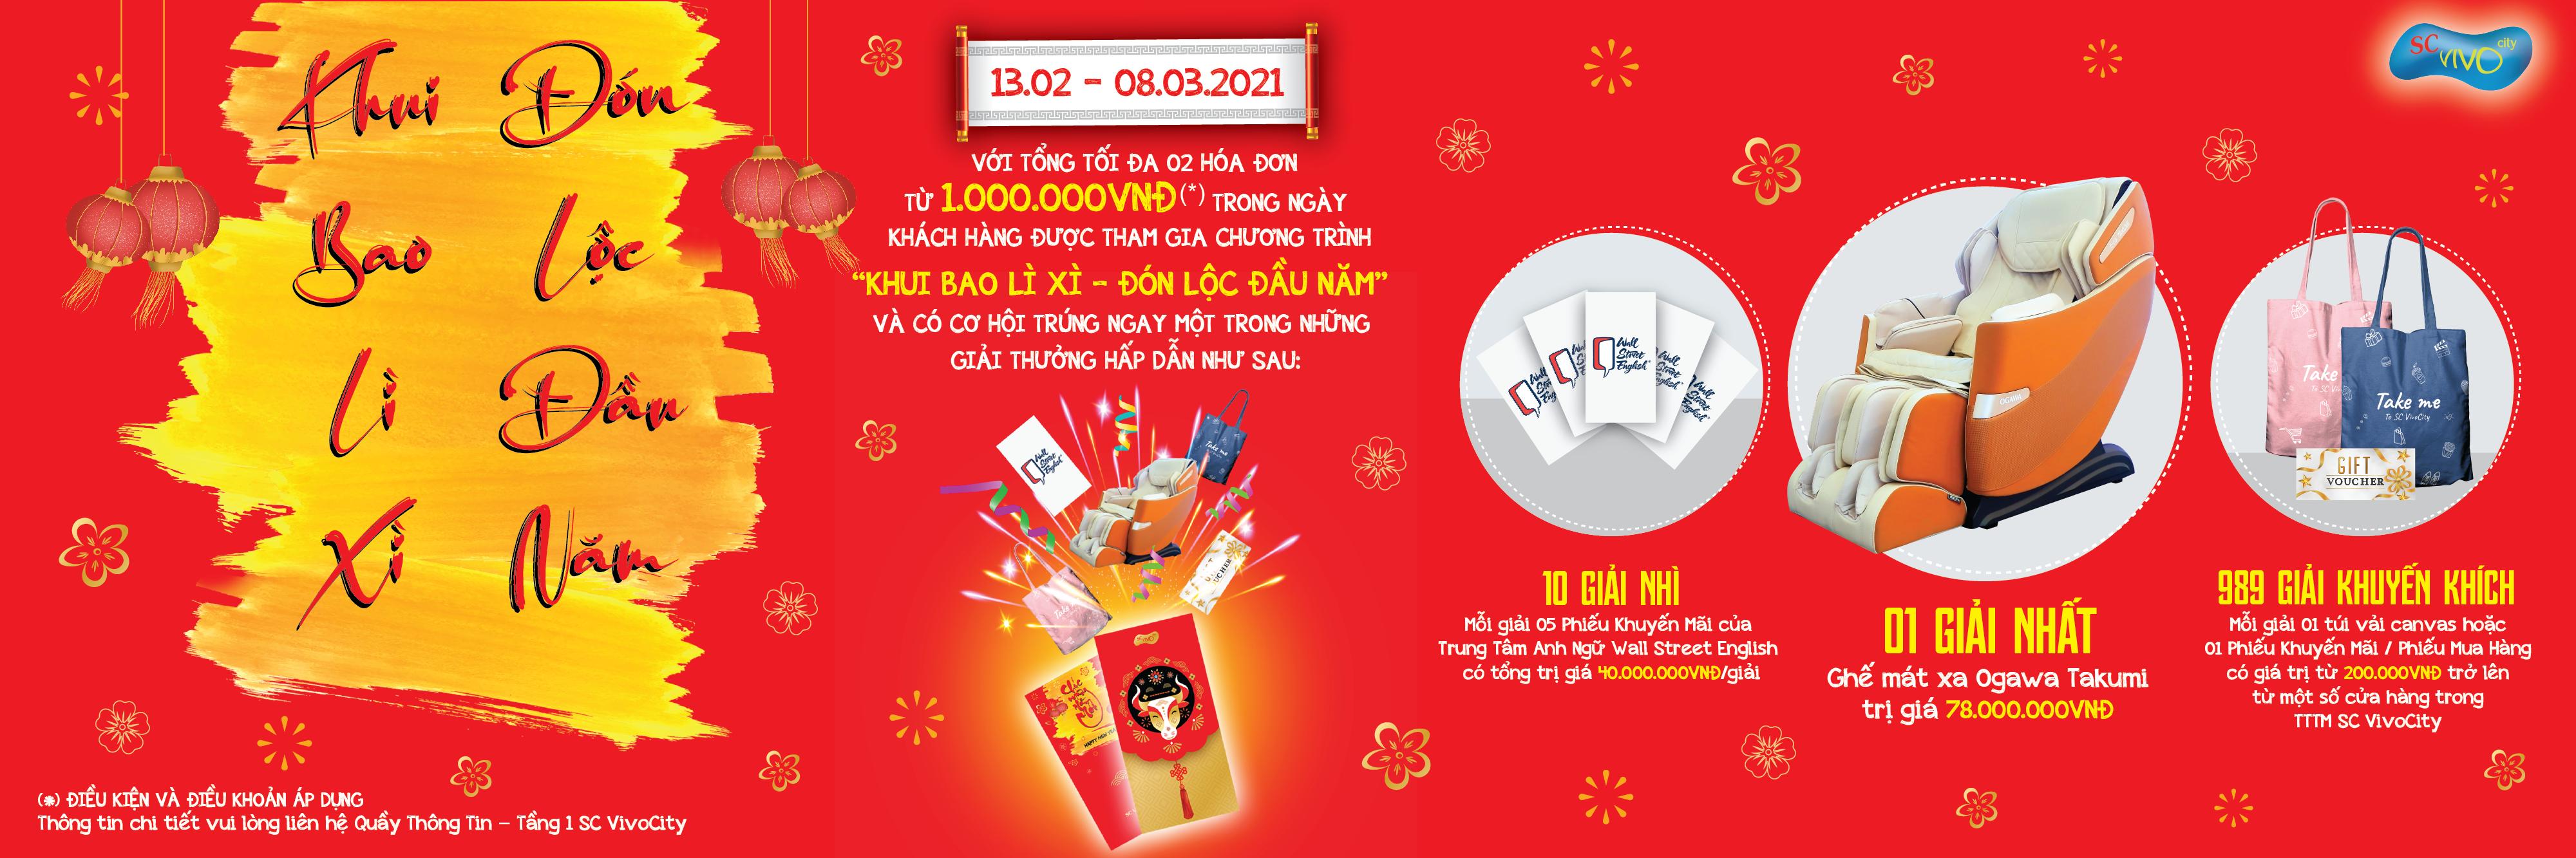 Tet 2021 - Promotion